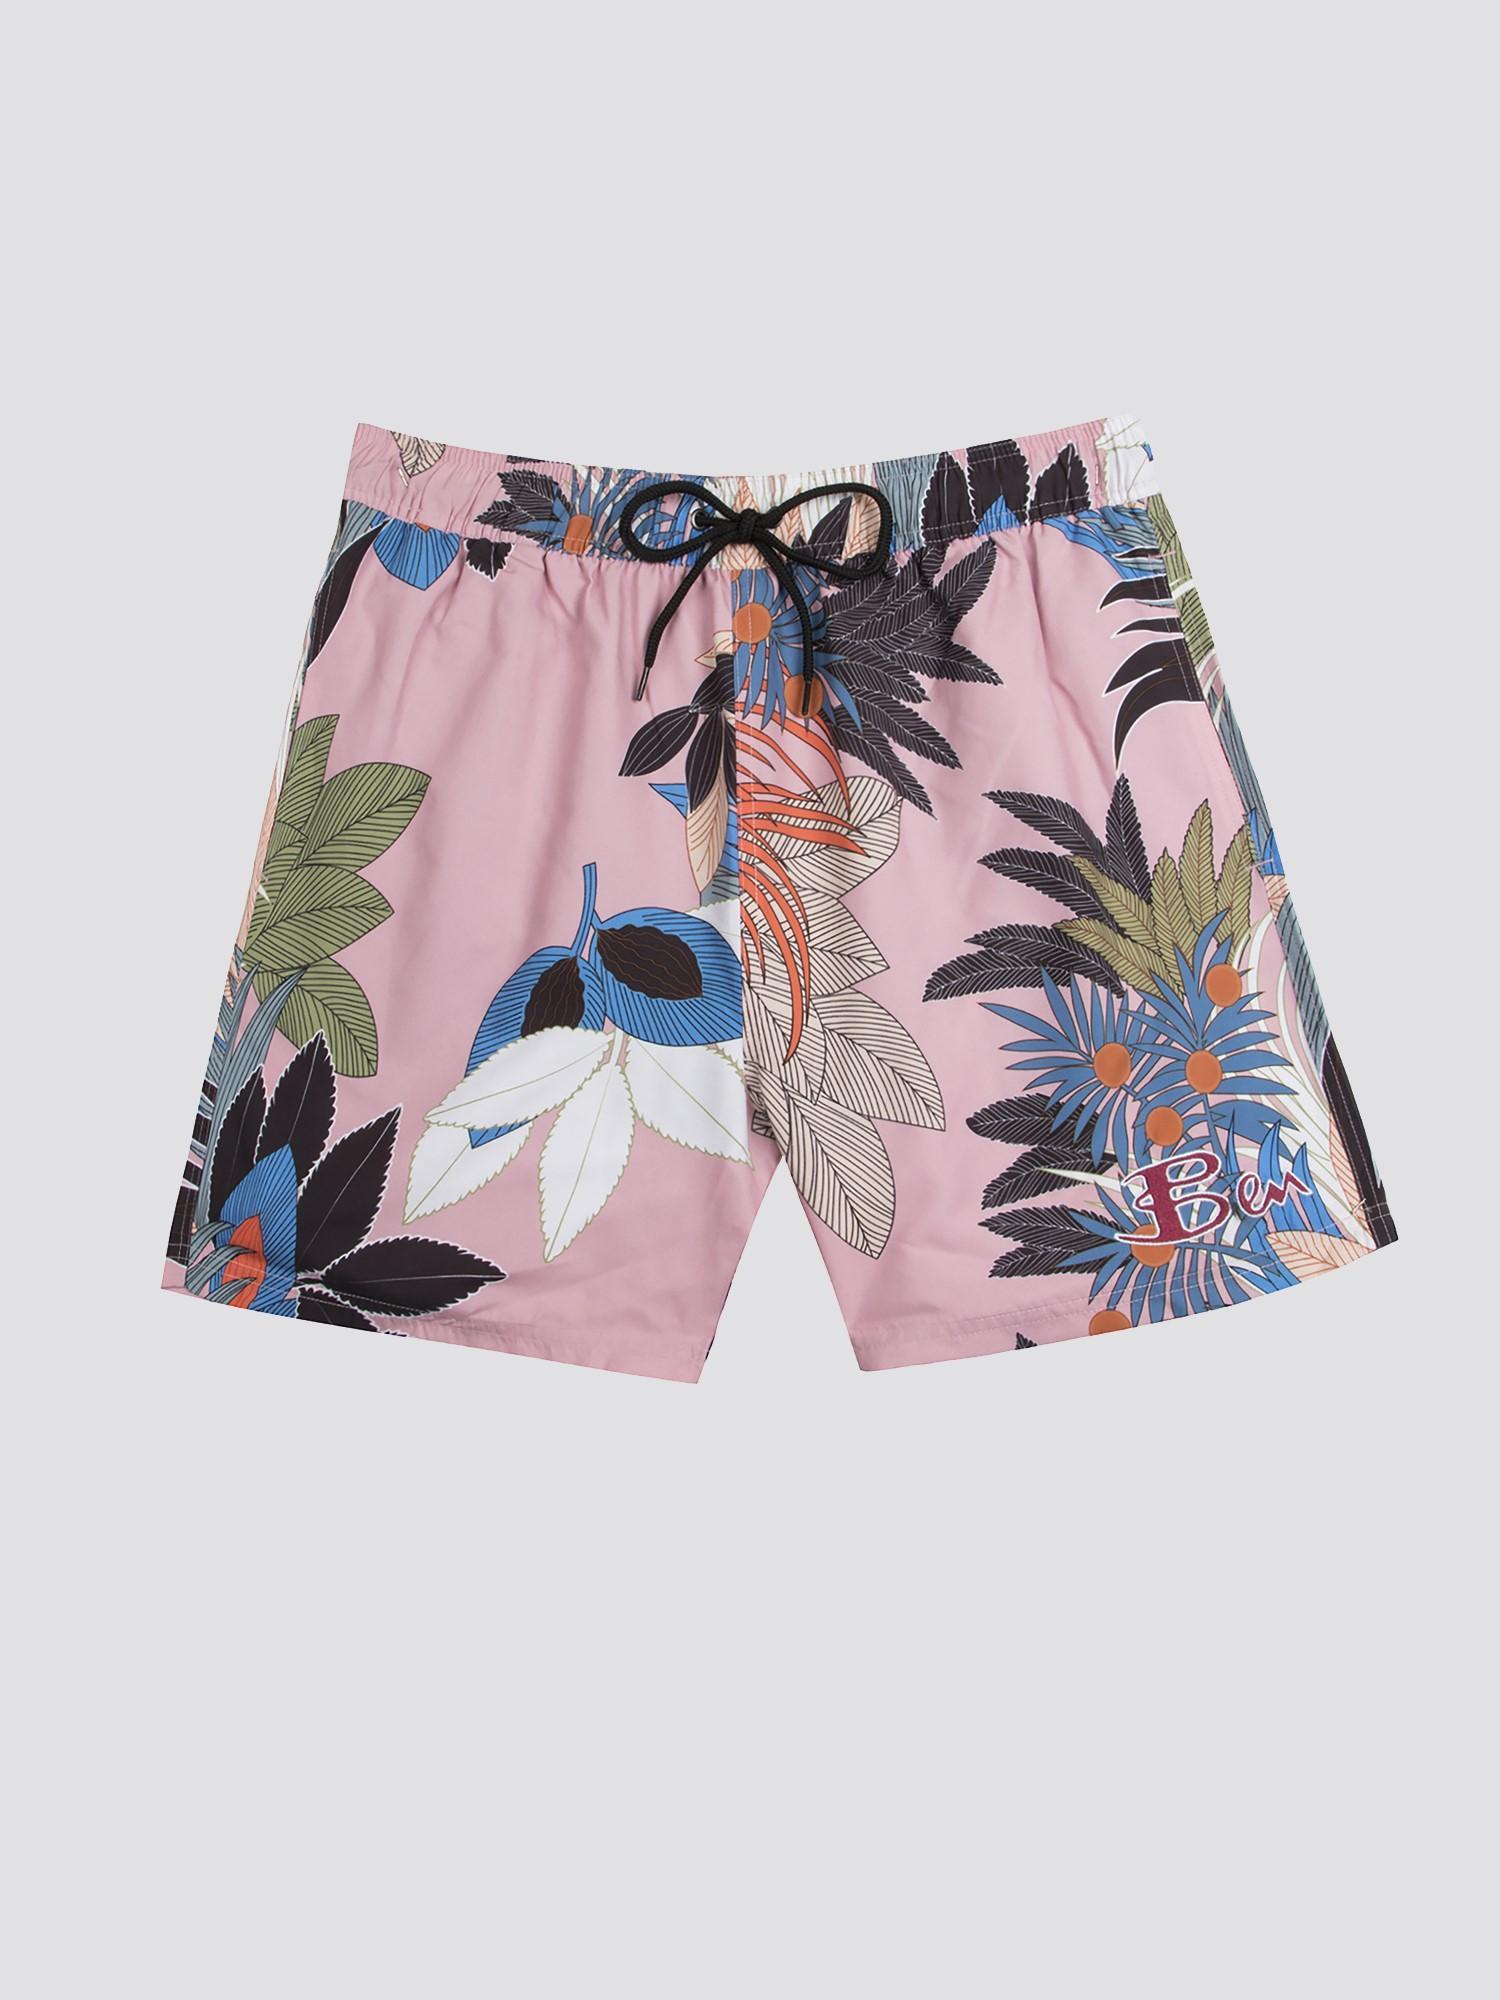 a618e4cb0c825 Ben Sherman Multi Tropical Print Swim Short for Men - Lyst